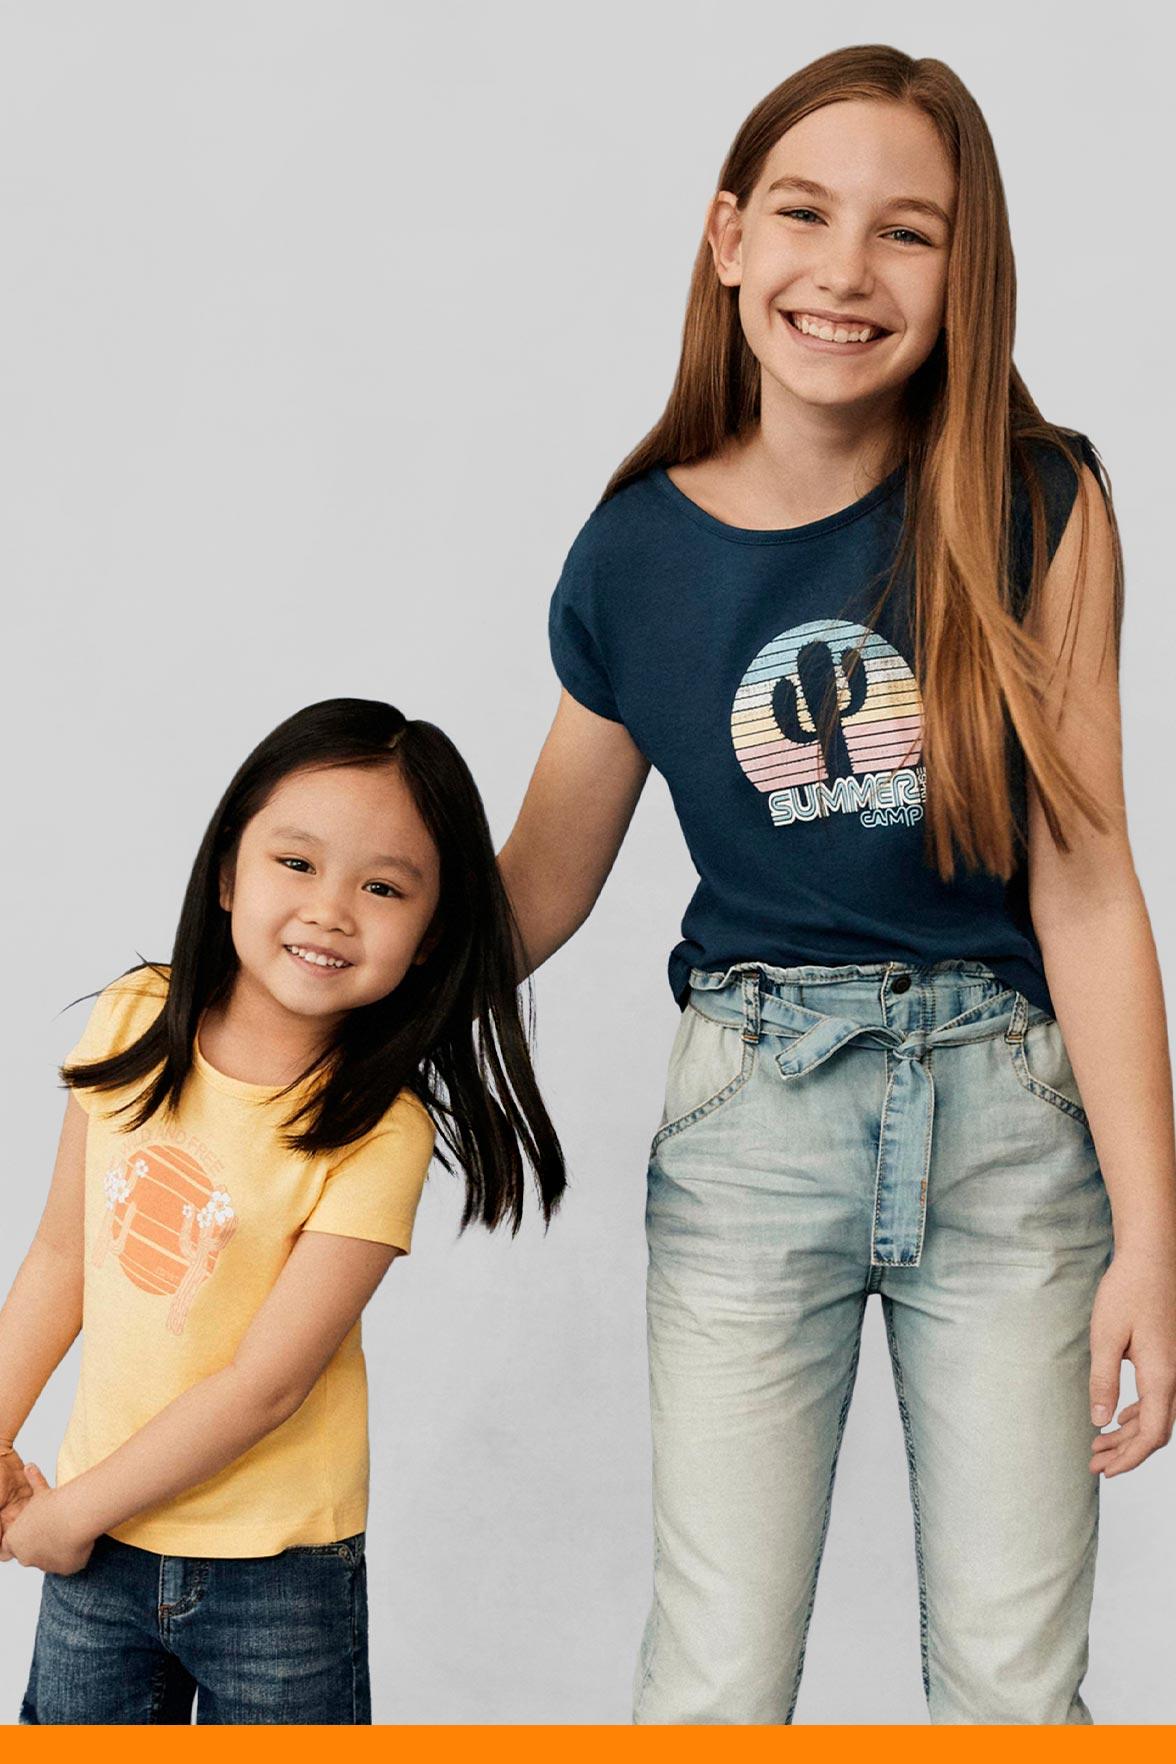 412021 - Sale - startpage - tile banner 7 - kids new in sale - IMG